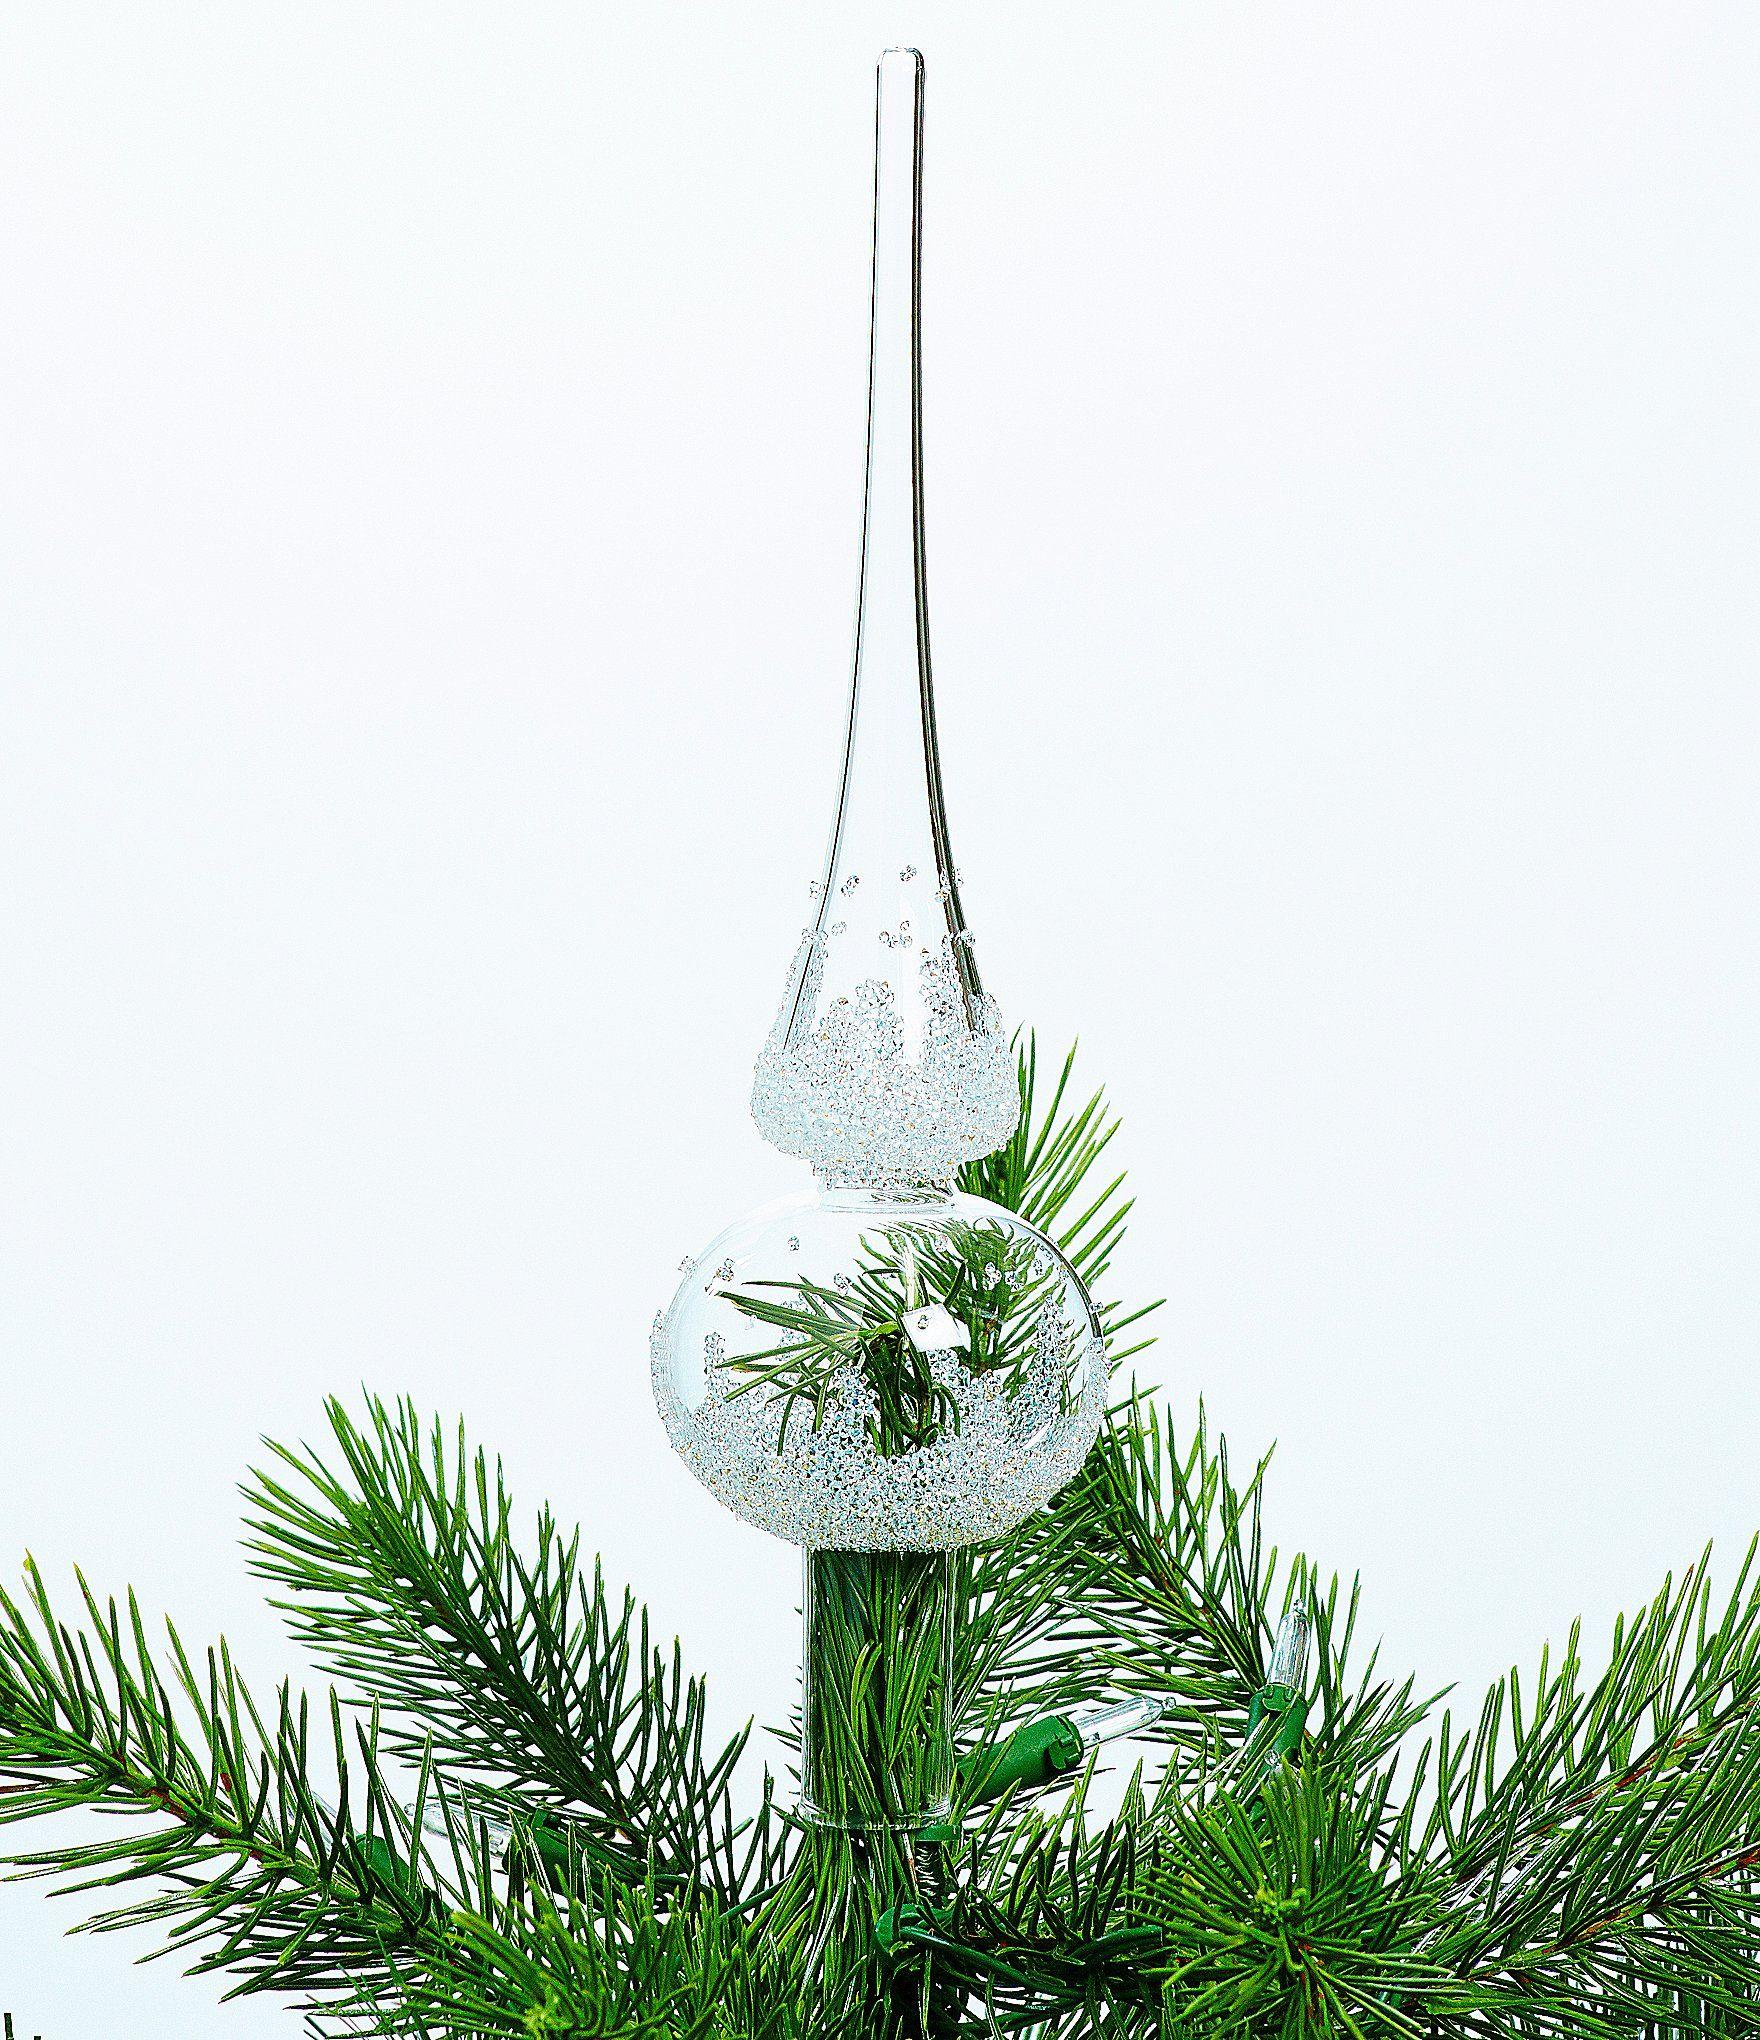 Christmas Tree Toppers 2020 Swarovski Crystal & Glass Christmas Tree Topper | Dillard's in